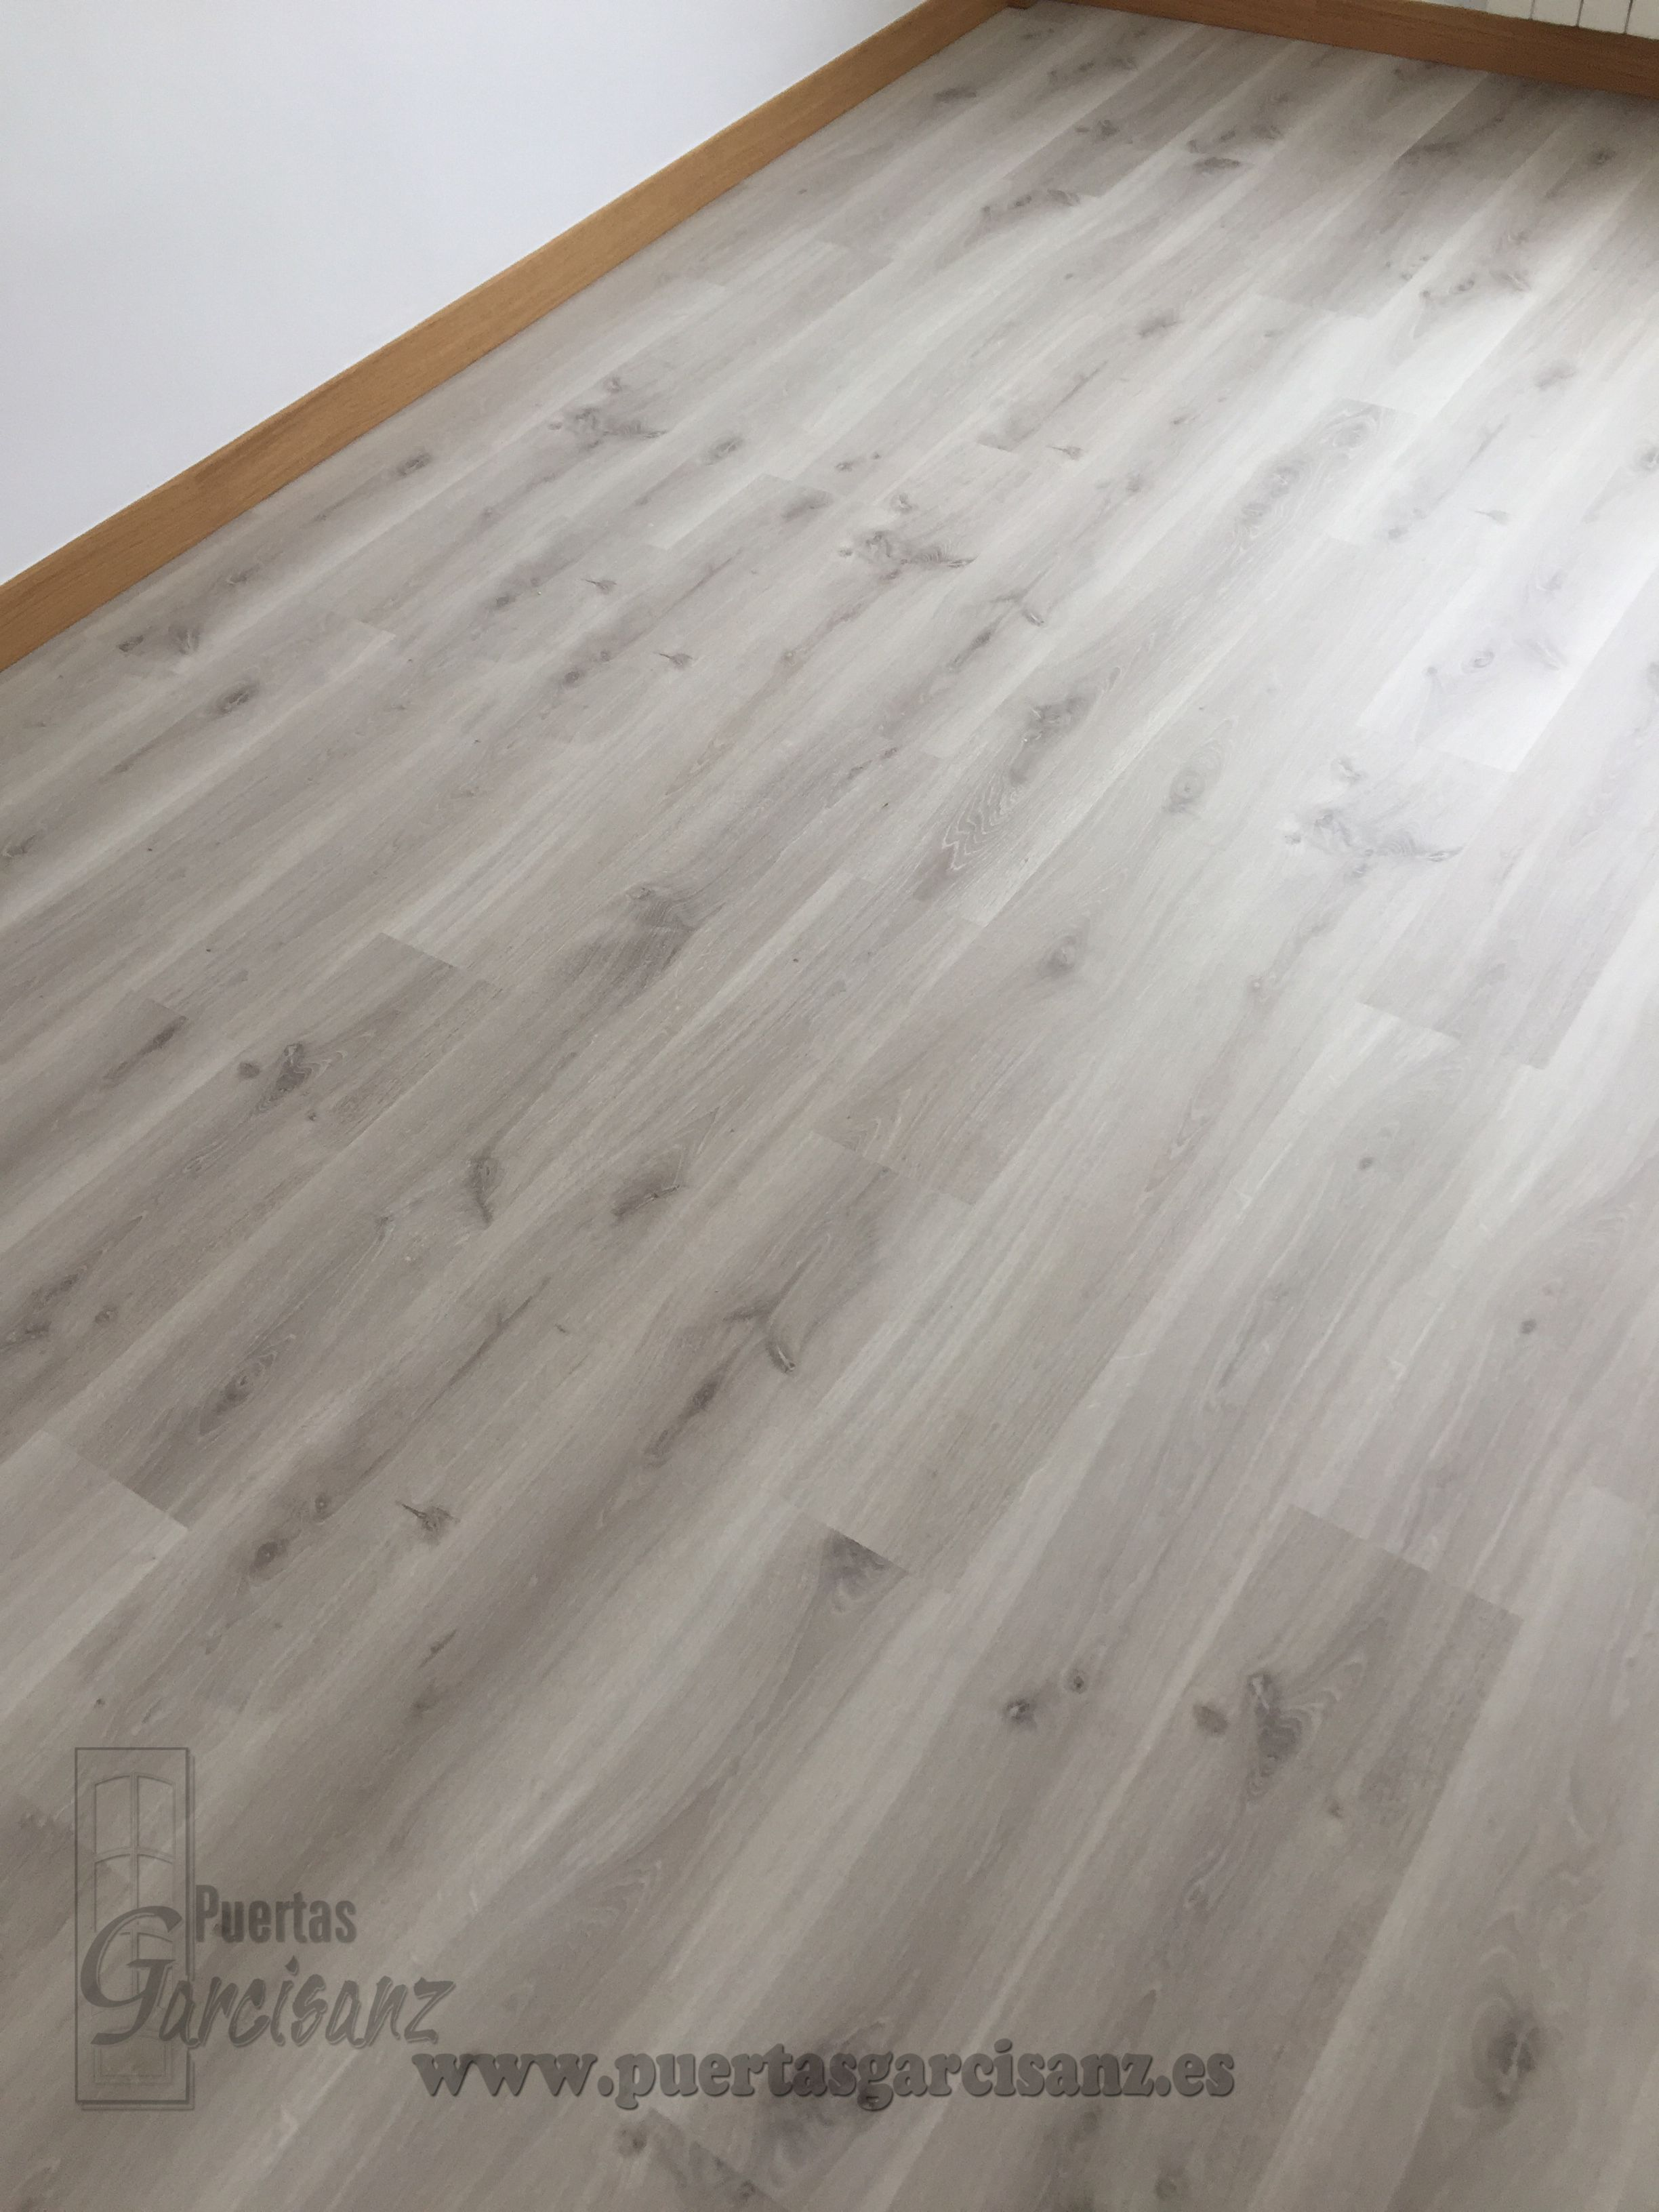 Basic suelo laminado gris ac5 buhardillas t suelo for Suelo laminado quick step leroy merlin